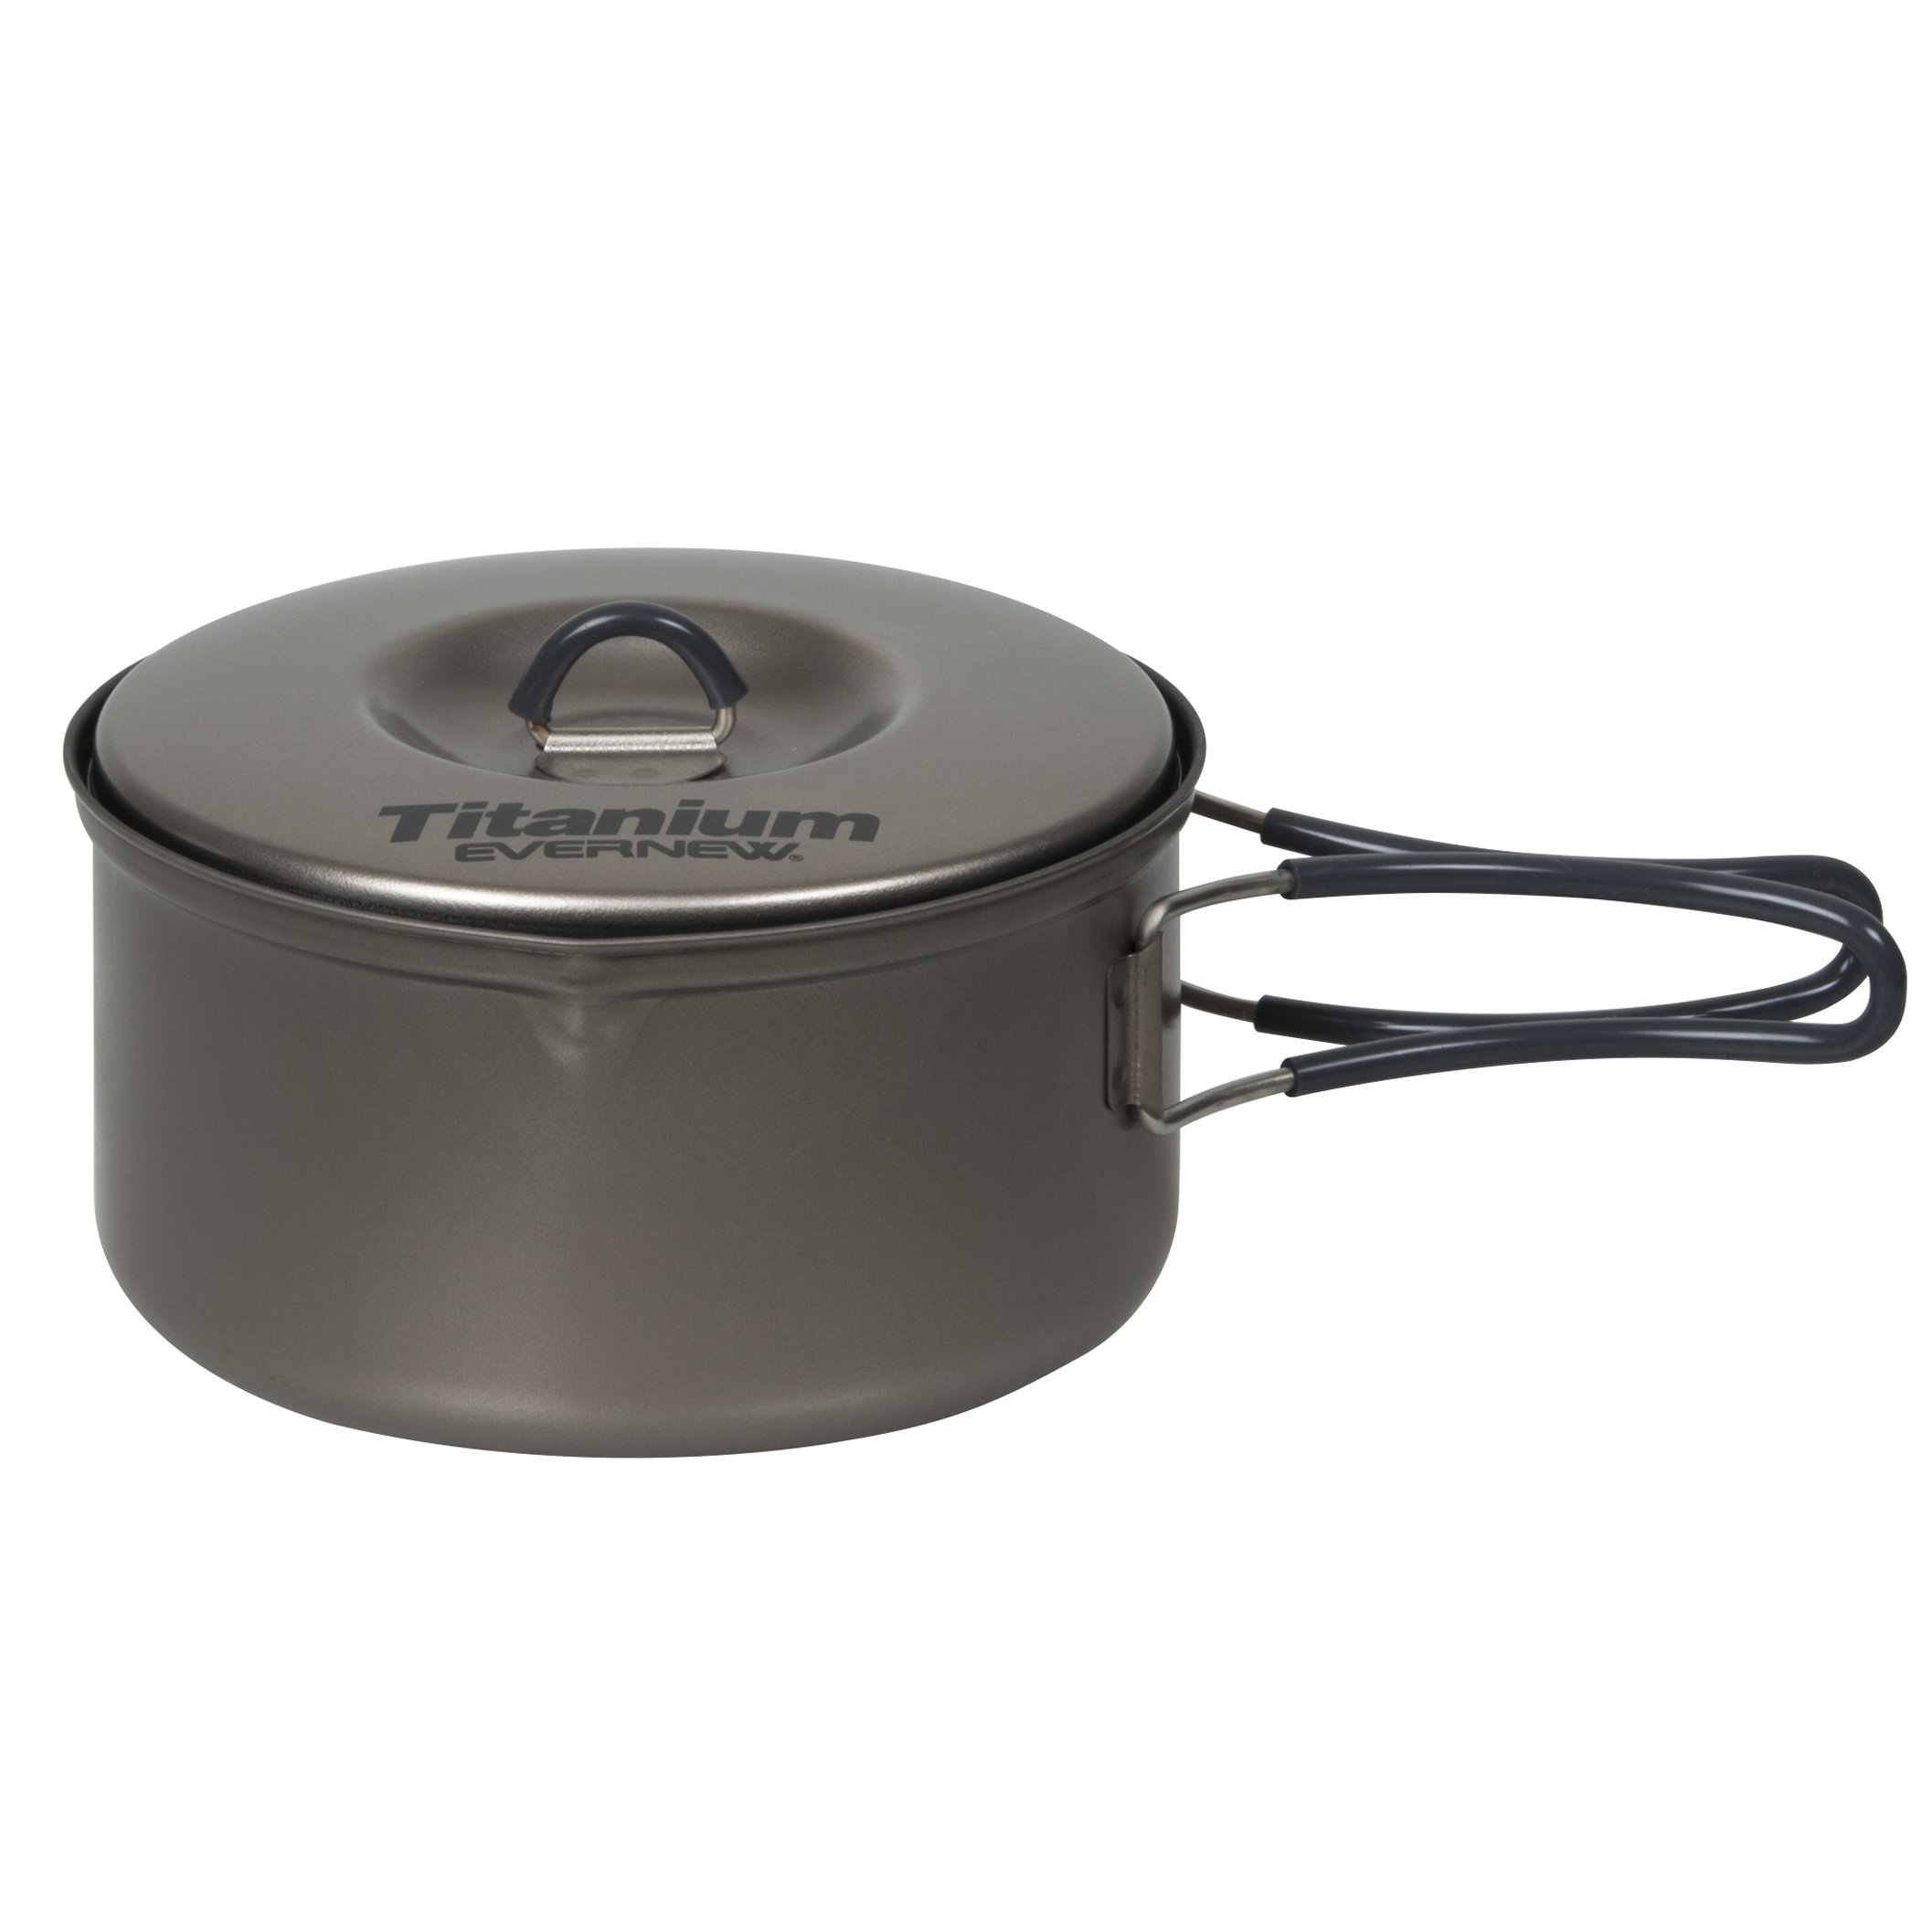 Evernew Titanium Non-Stick Pot, 0.9-Liter